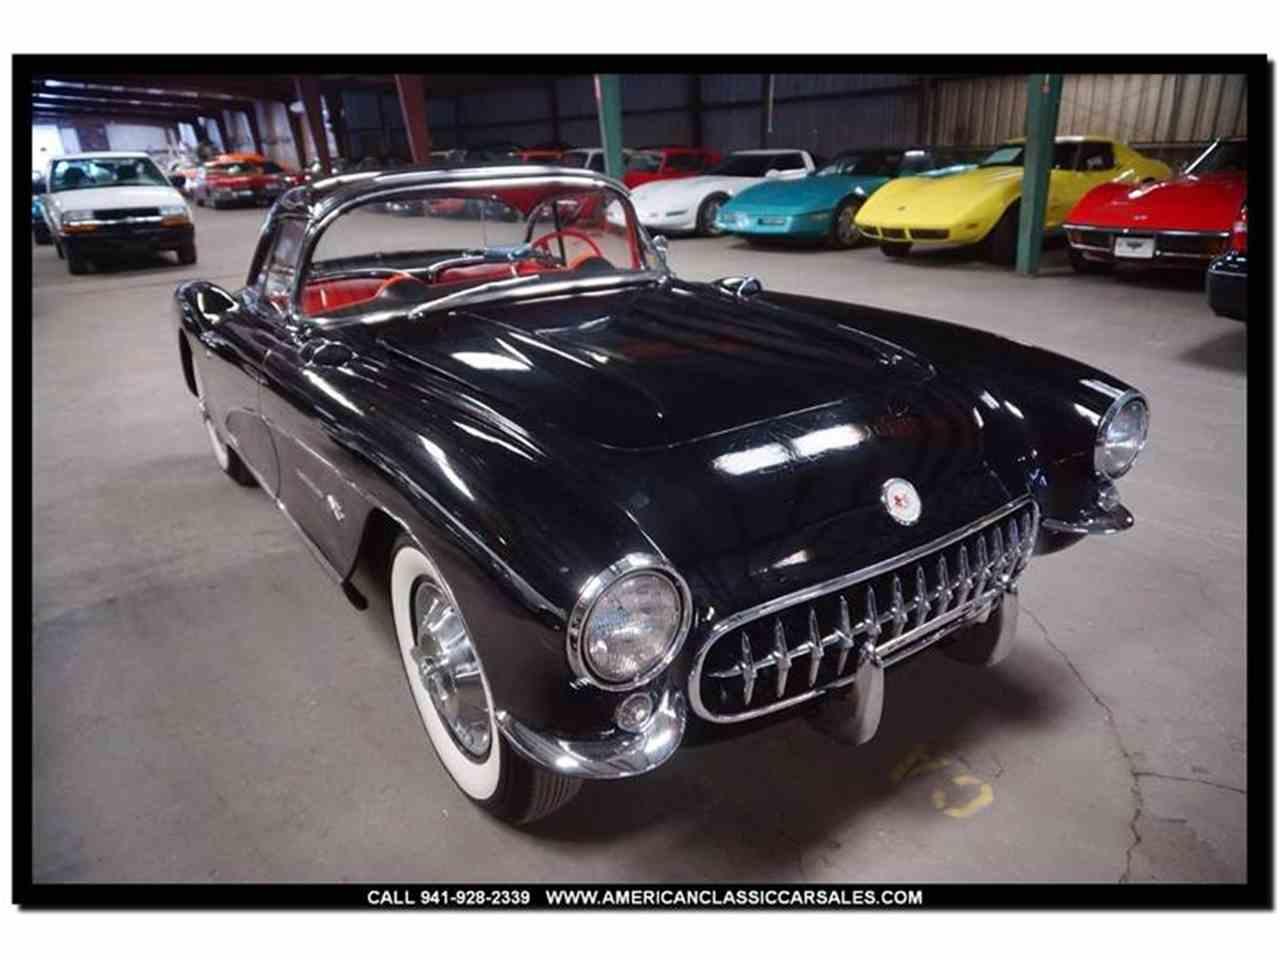 1957 chevrolet corvette for sale on classiccars com 31 - Photo 33